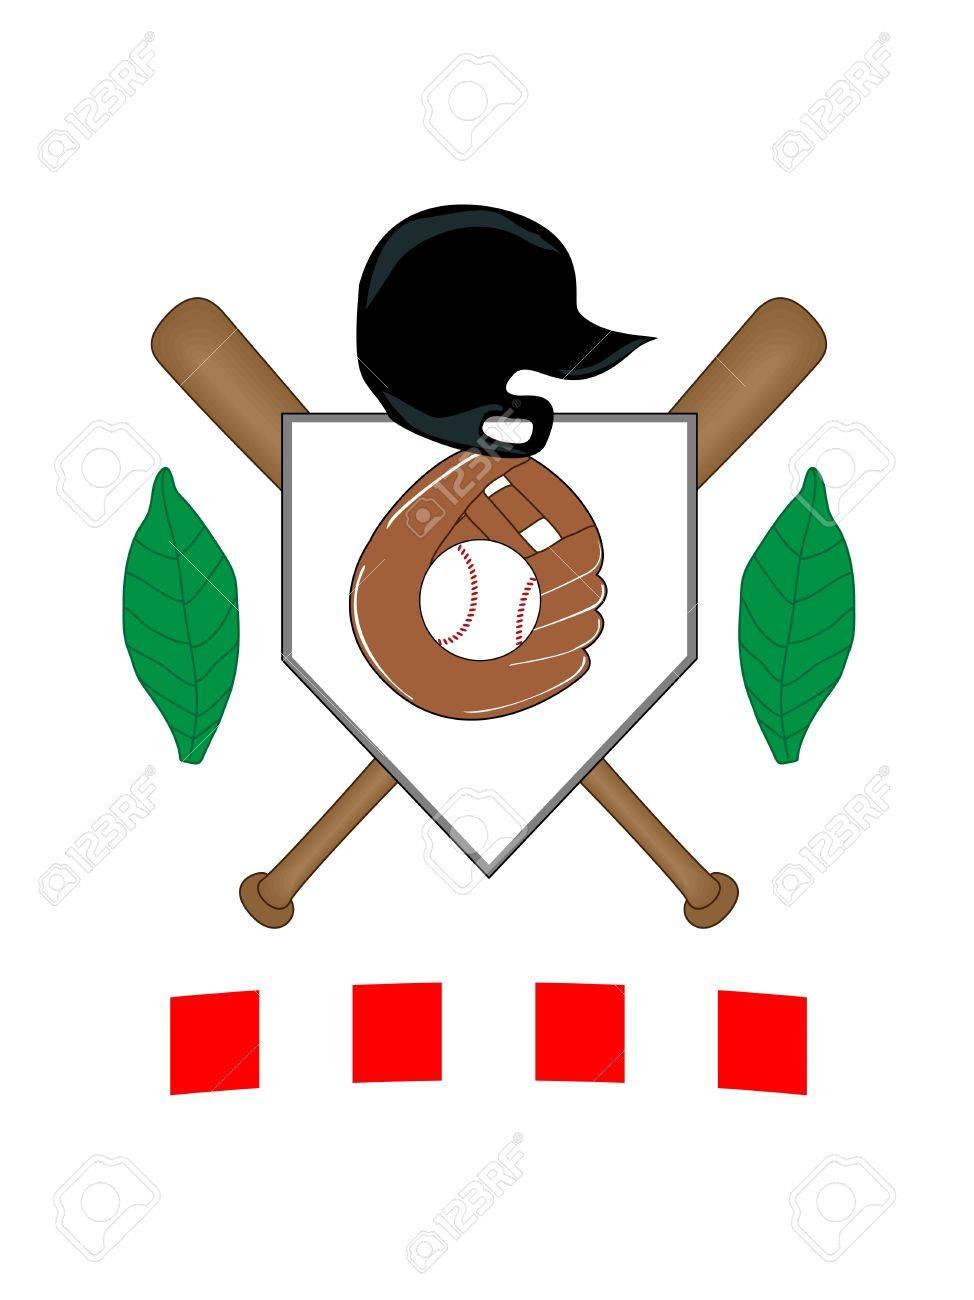 Baseball Coat of Arms Stock Vector - 11053005